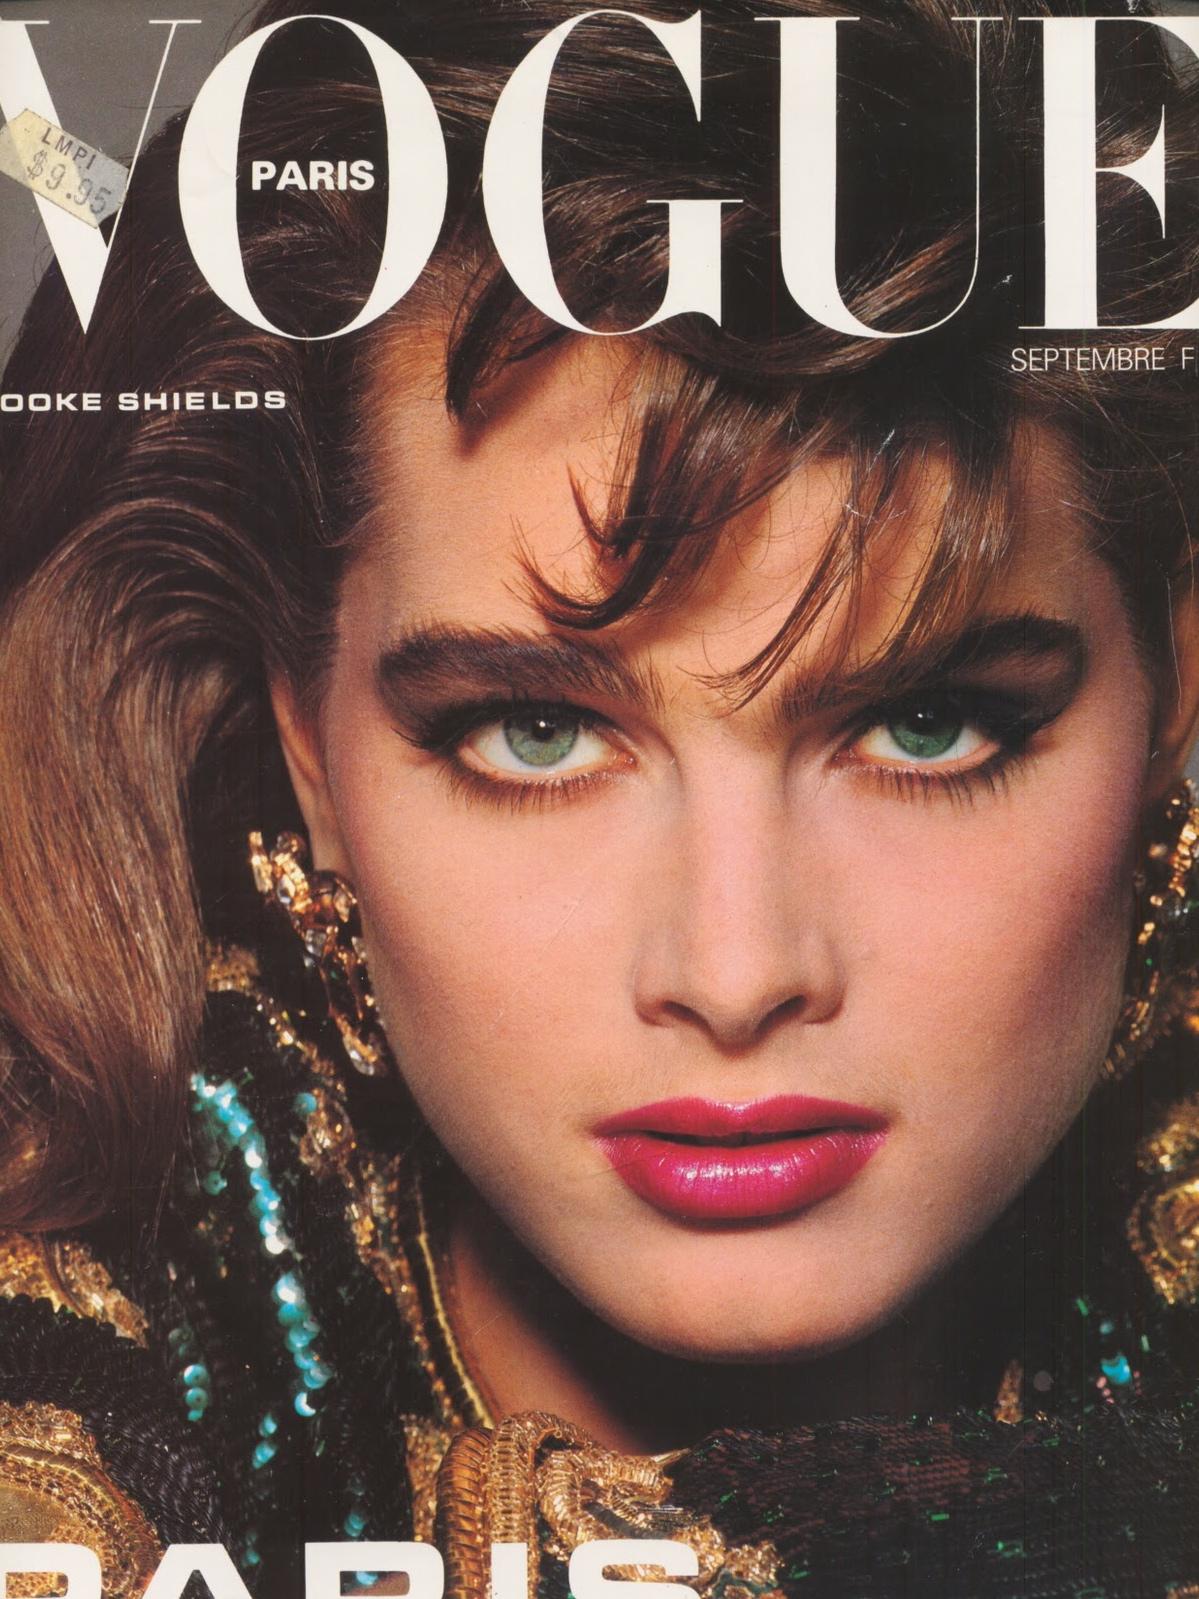 Vogue (Paris) September 1983 | Brooke Shields